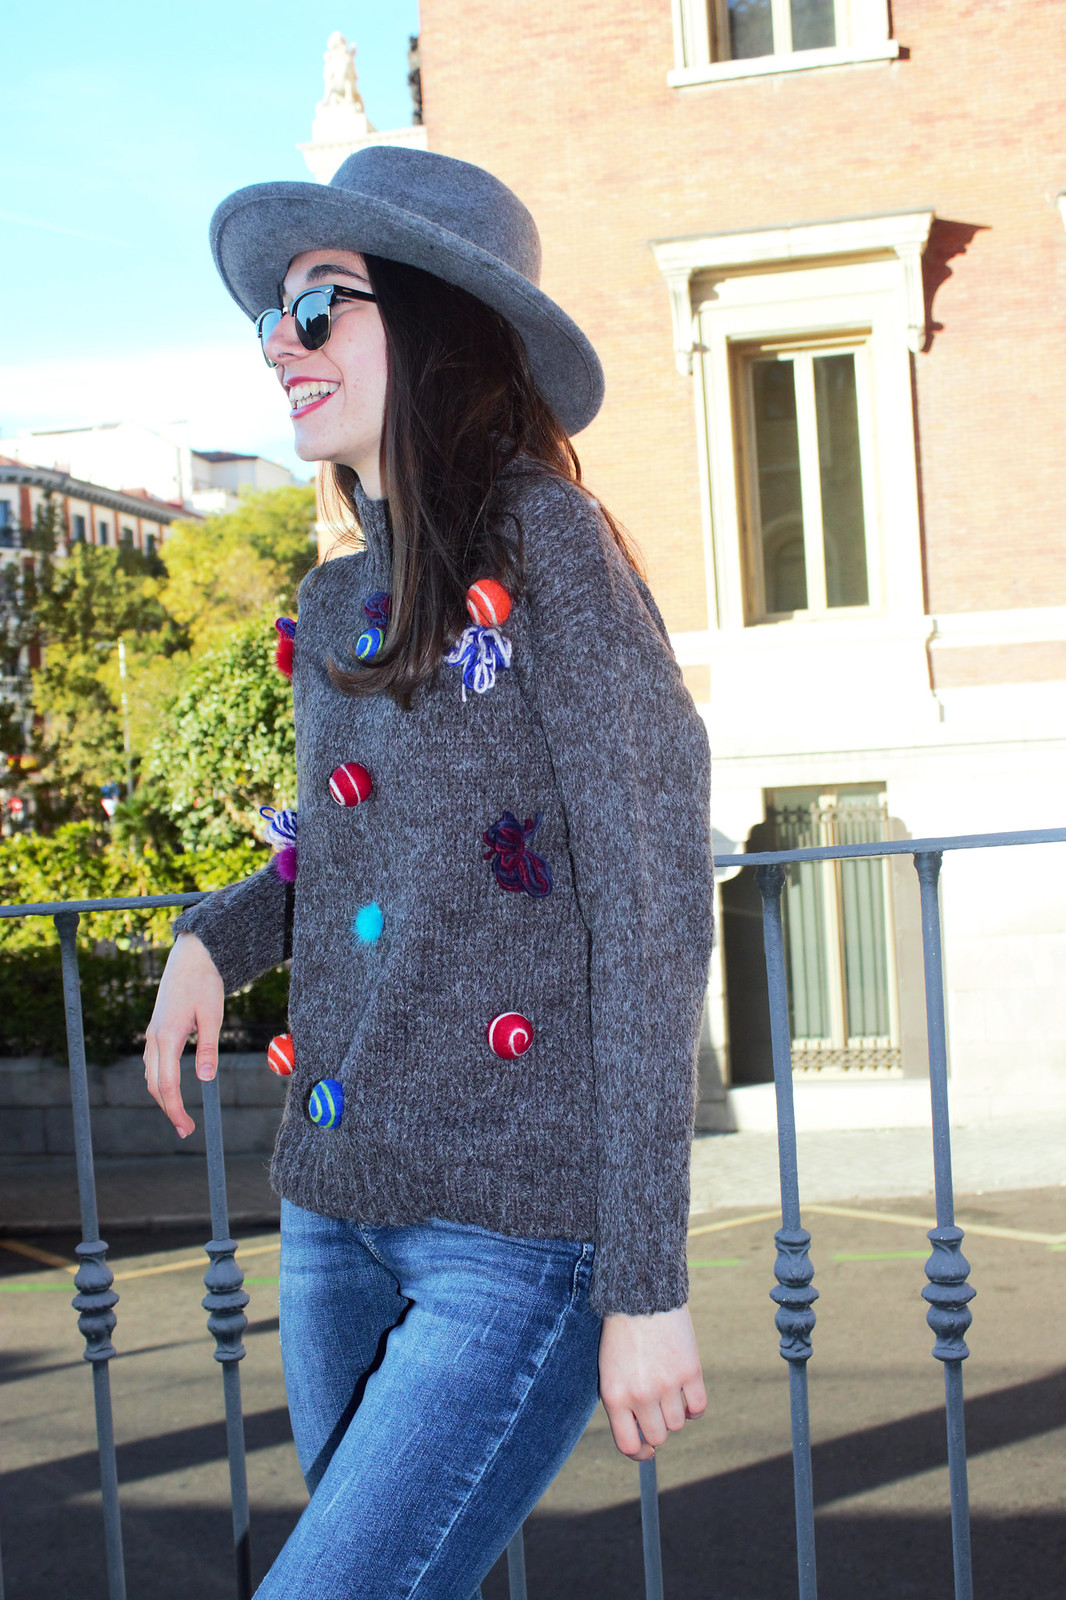 madlula-fashion-streetstyle-chic-jersey-alegría-gris-moda